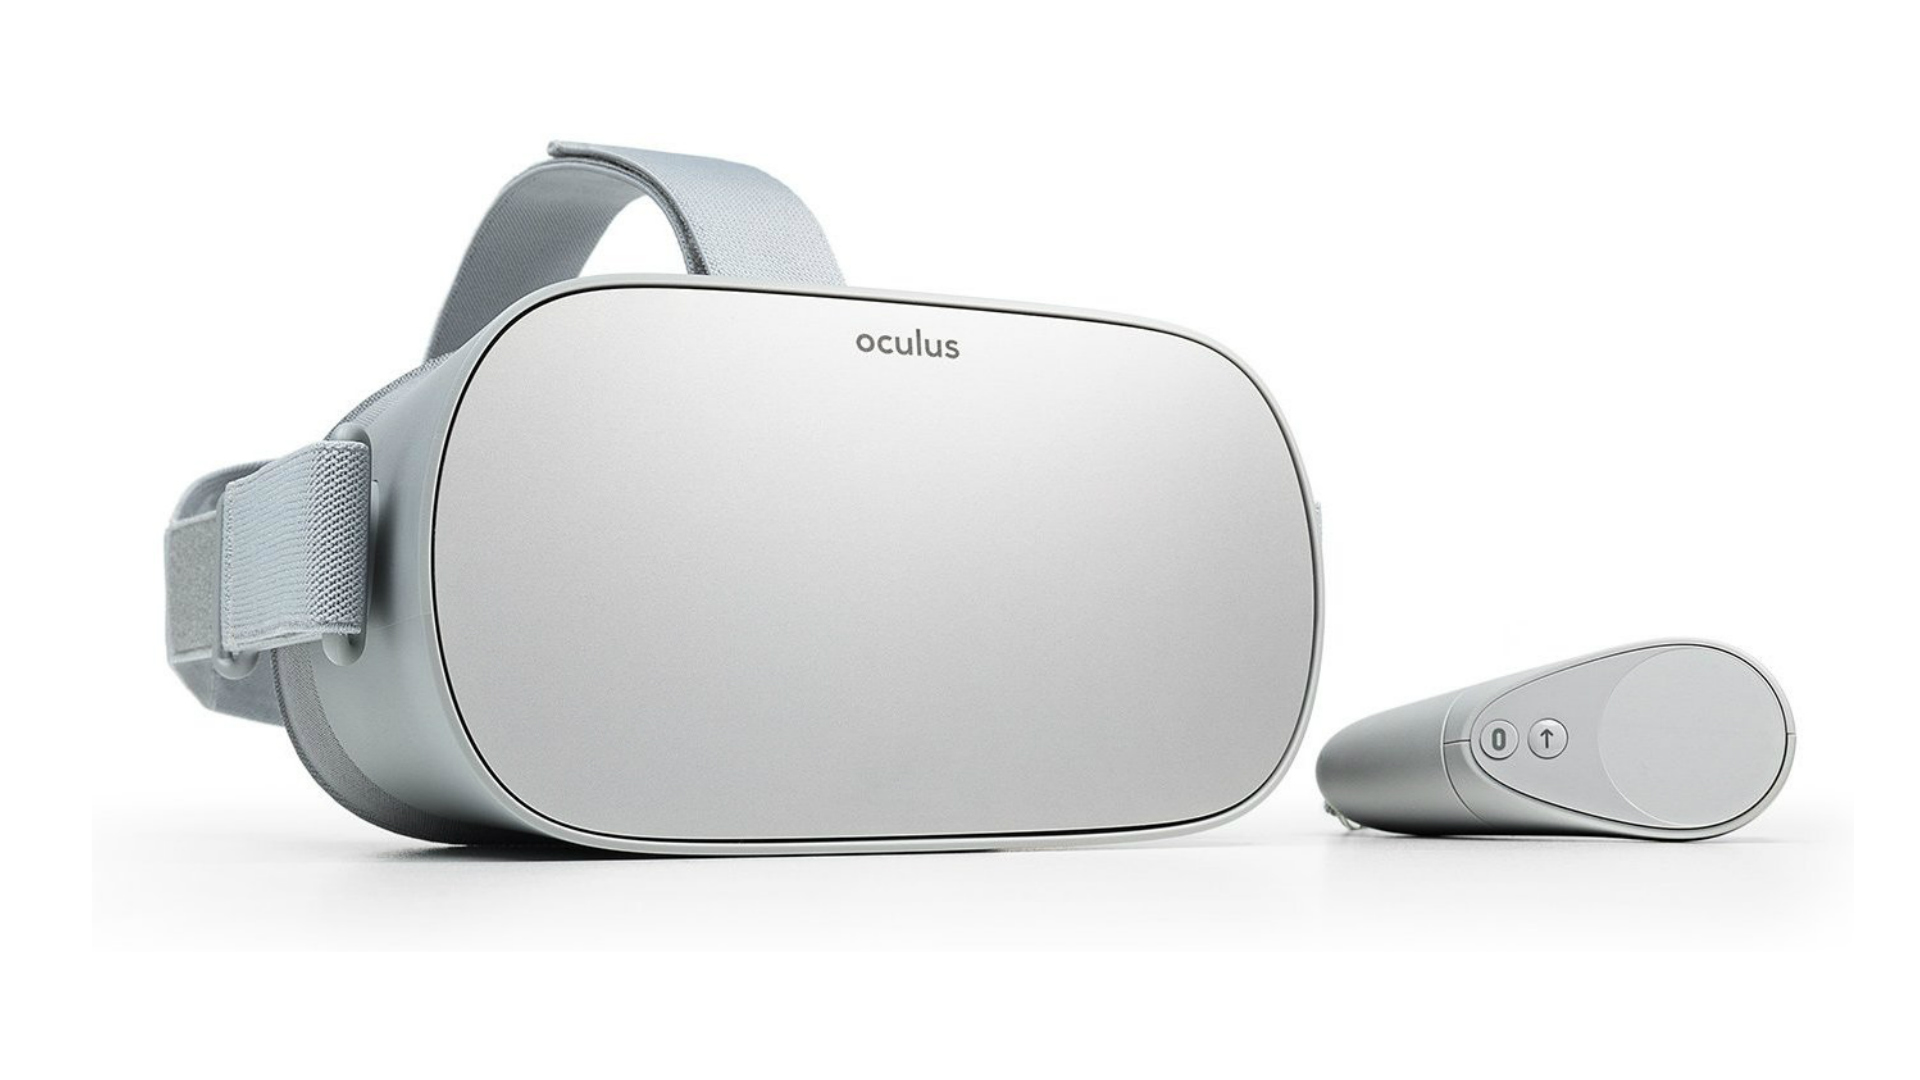 How Sideload An App To Oculus Go Without Oculus Store - Minecraft oculus rift spielen